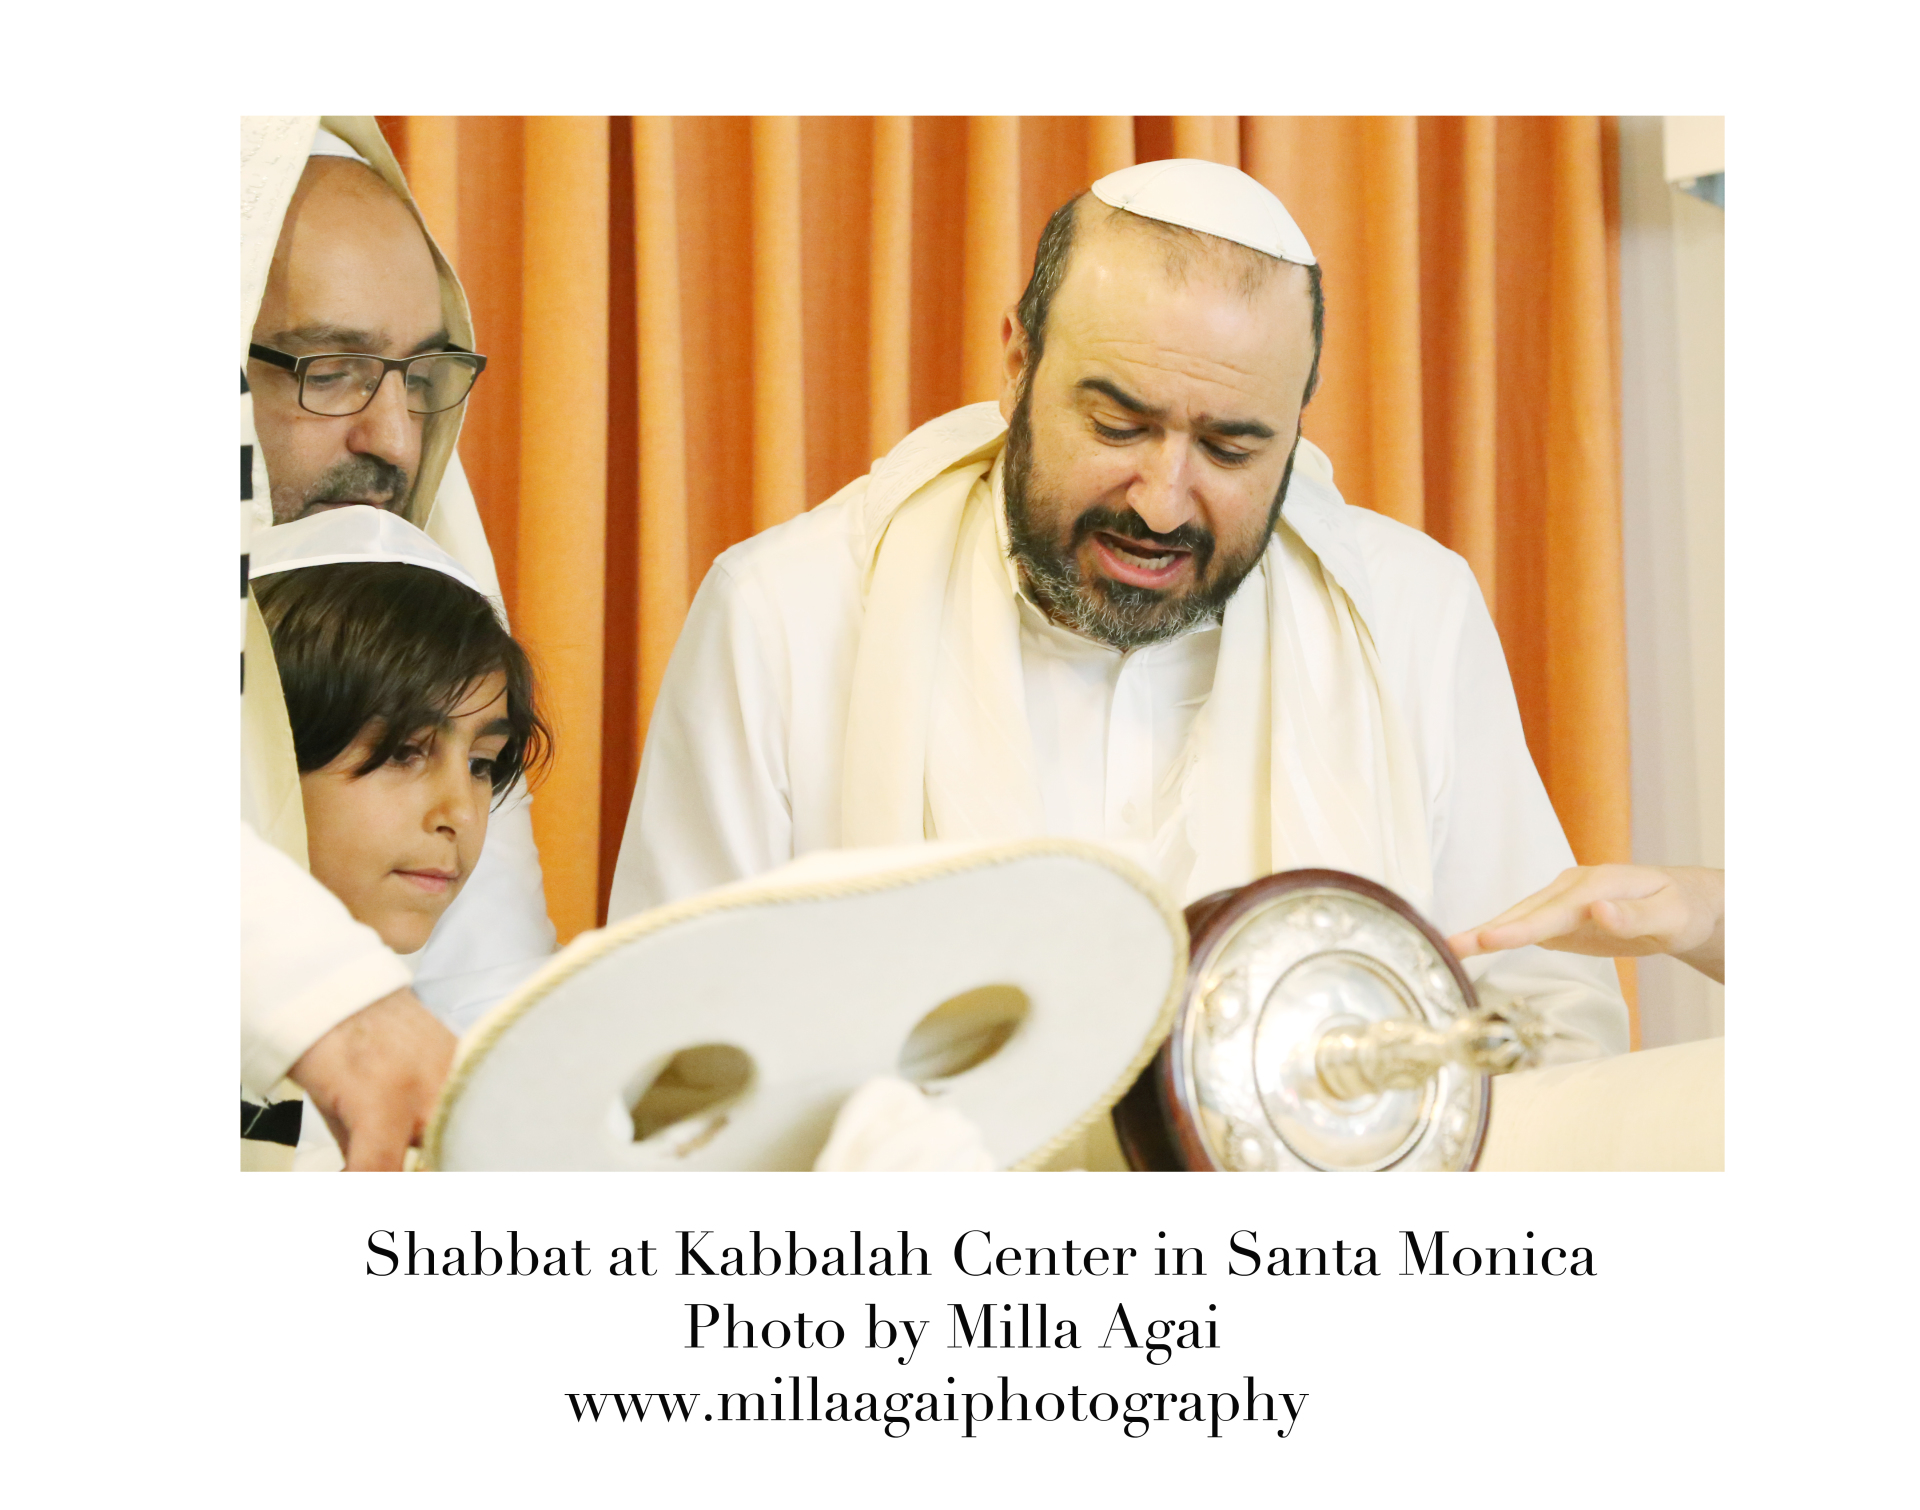 Shabbat at Kabbalah Center In Santa Monica